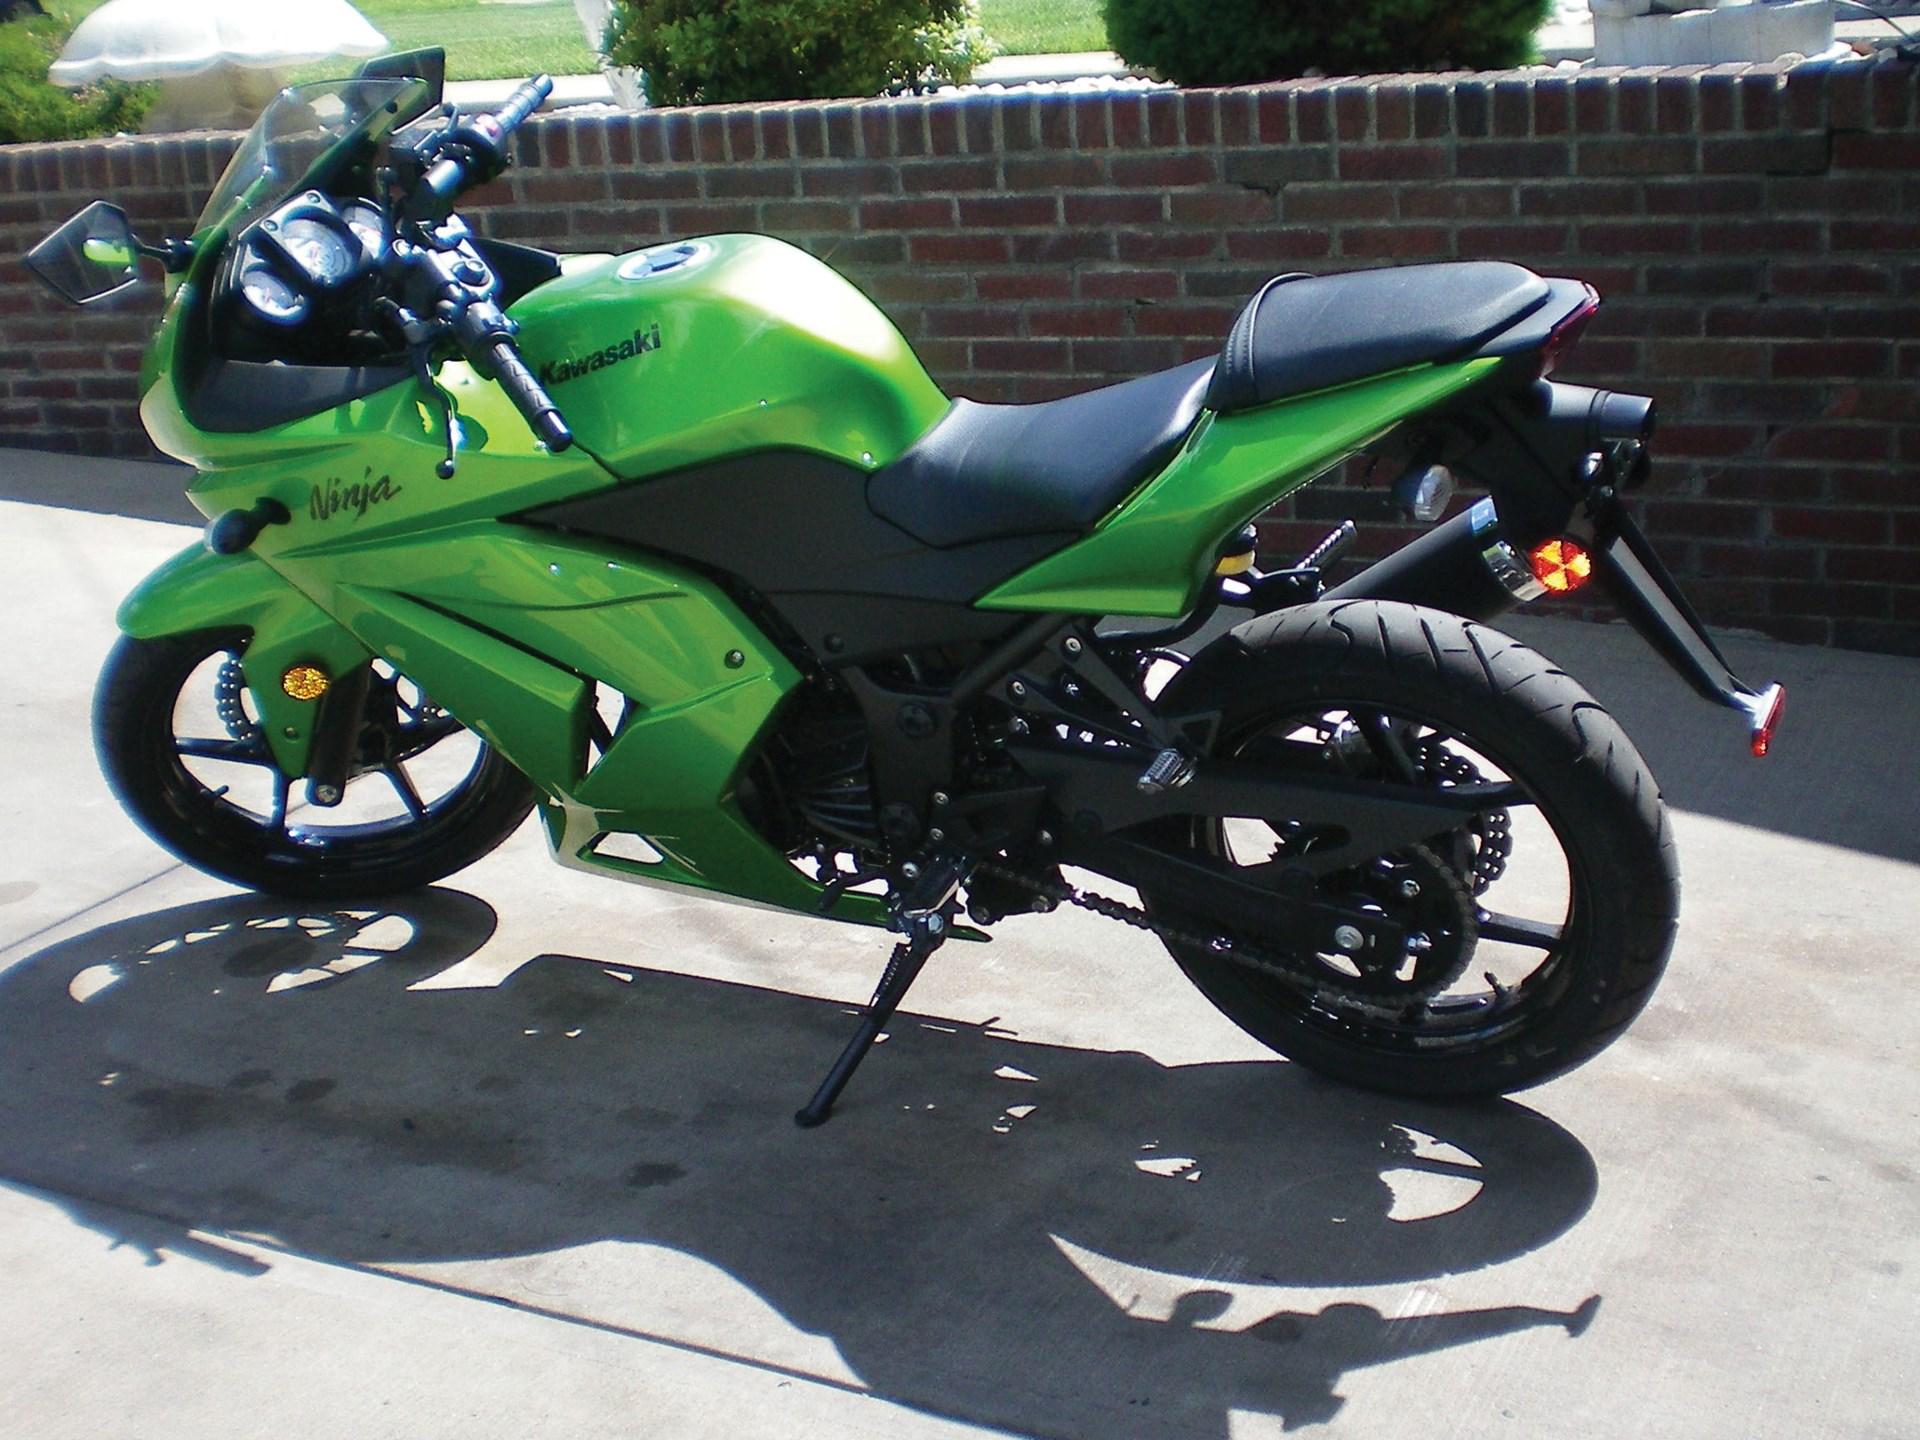 RM Sotheby's - 2012 Kawasaki Ninja 250R | Fall Carlisle 2013